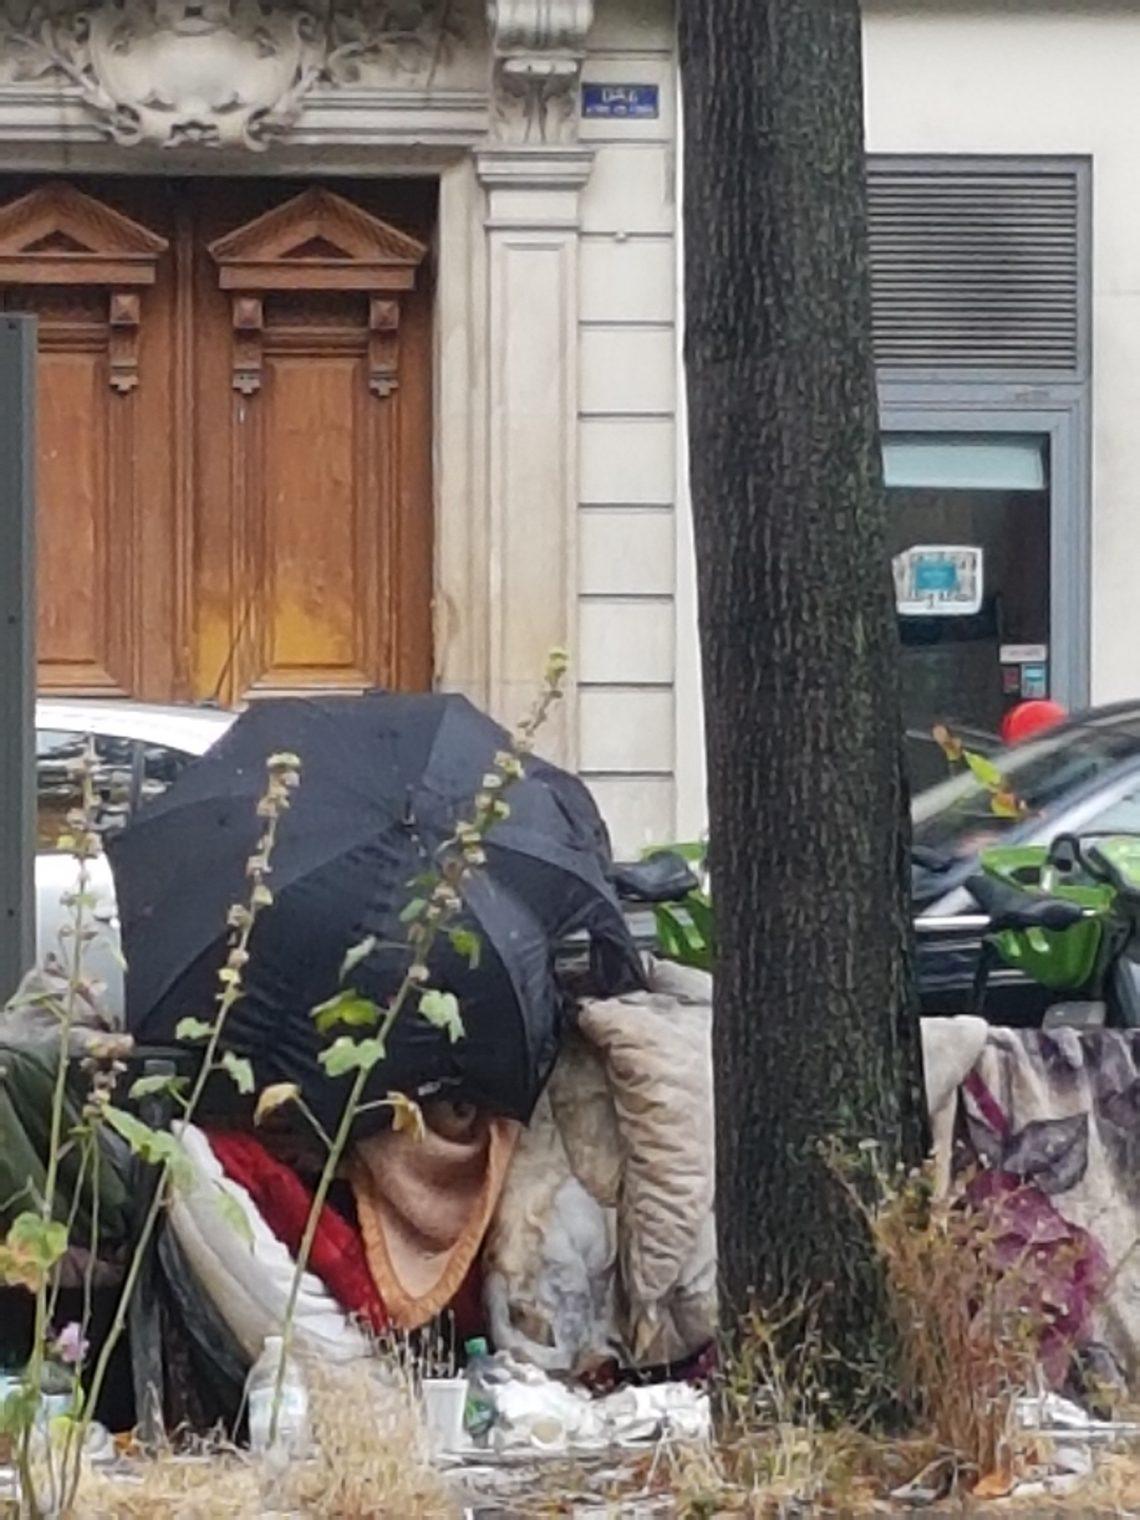 Street Homeless in Paris